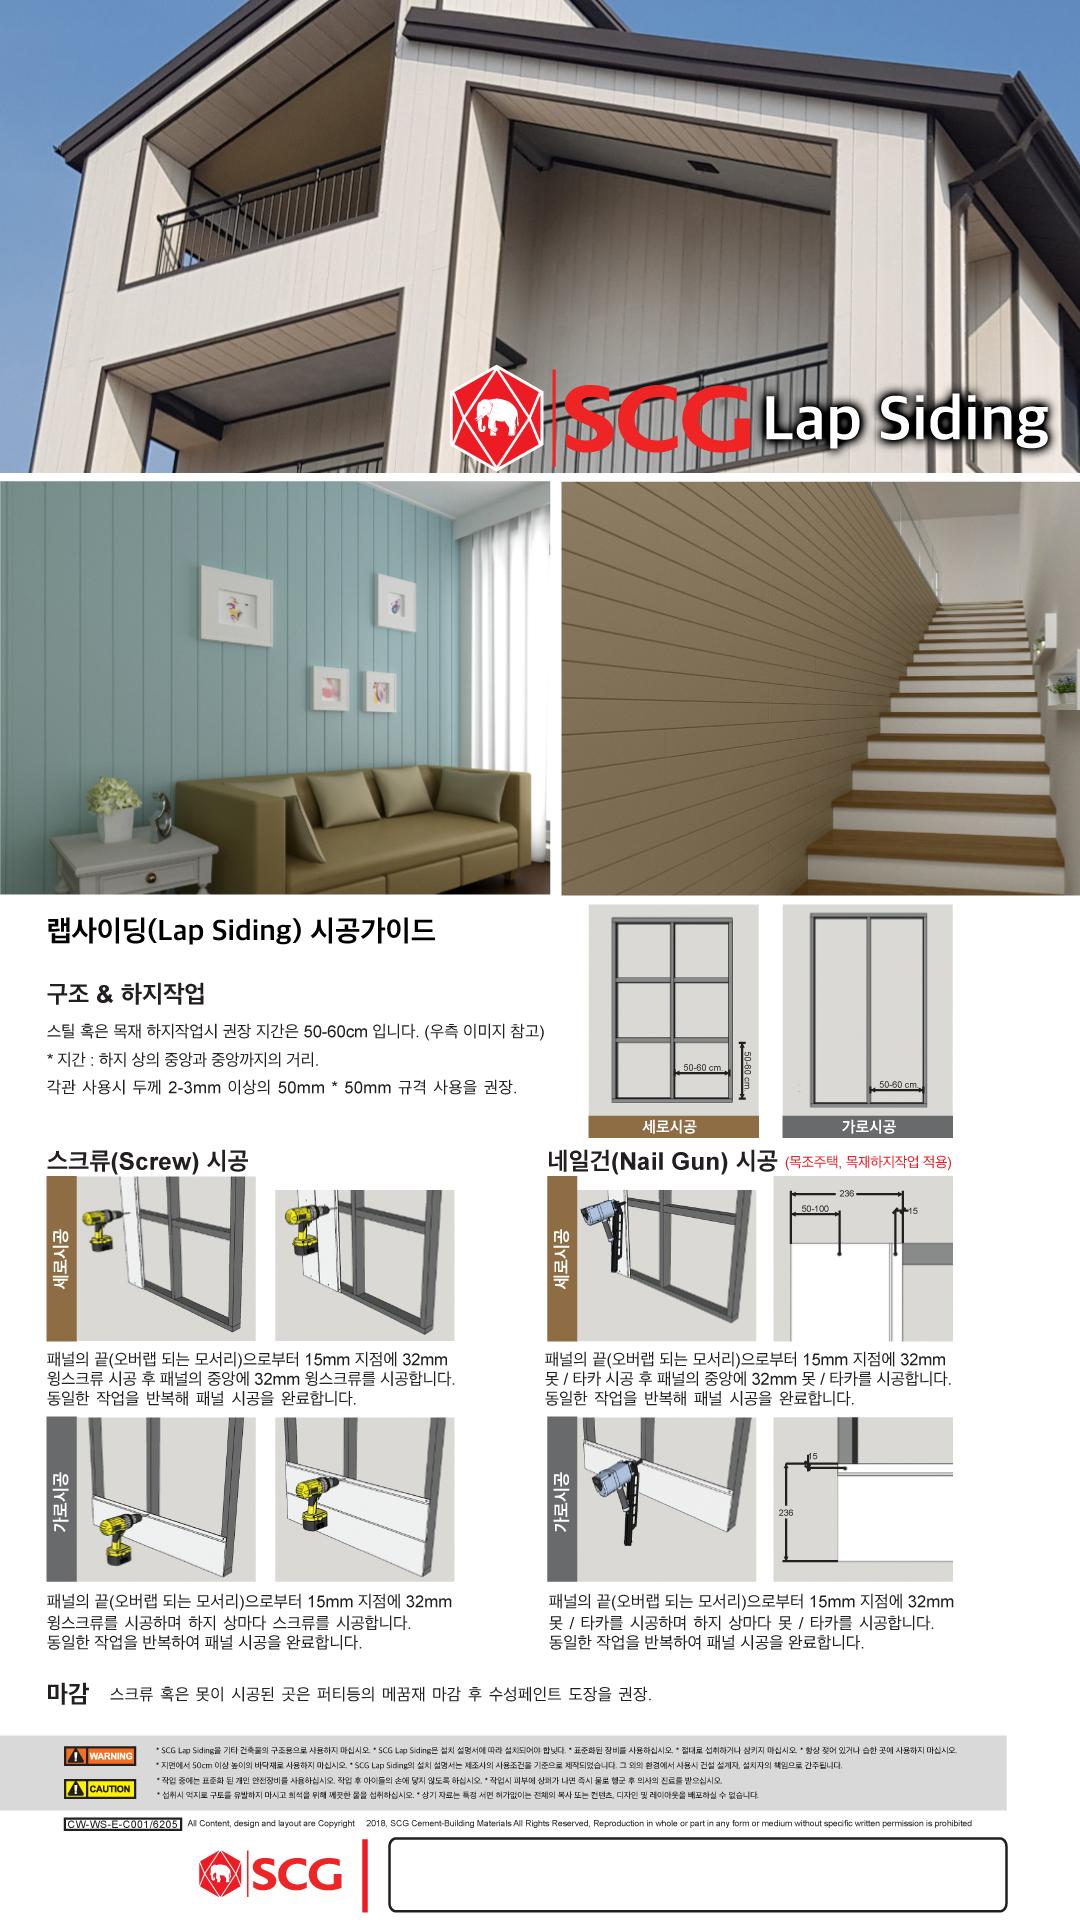 Lap-Siding-시공가이드.png